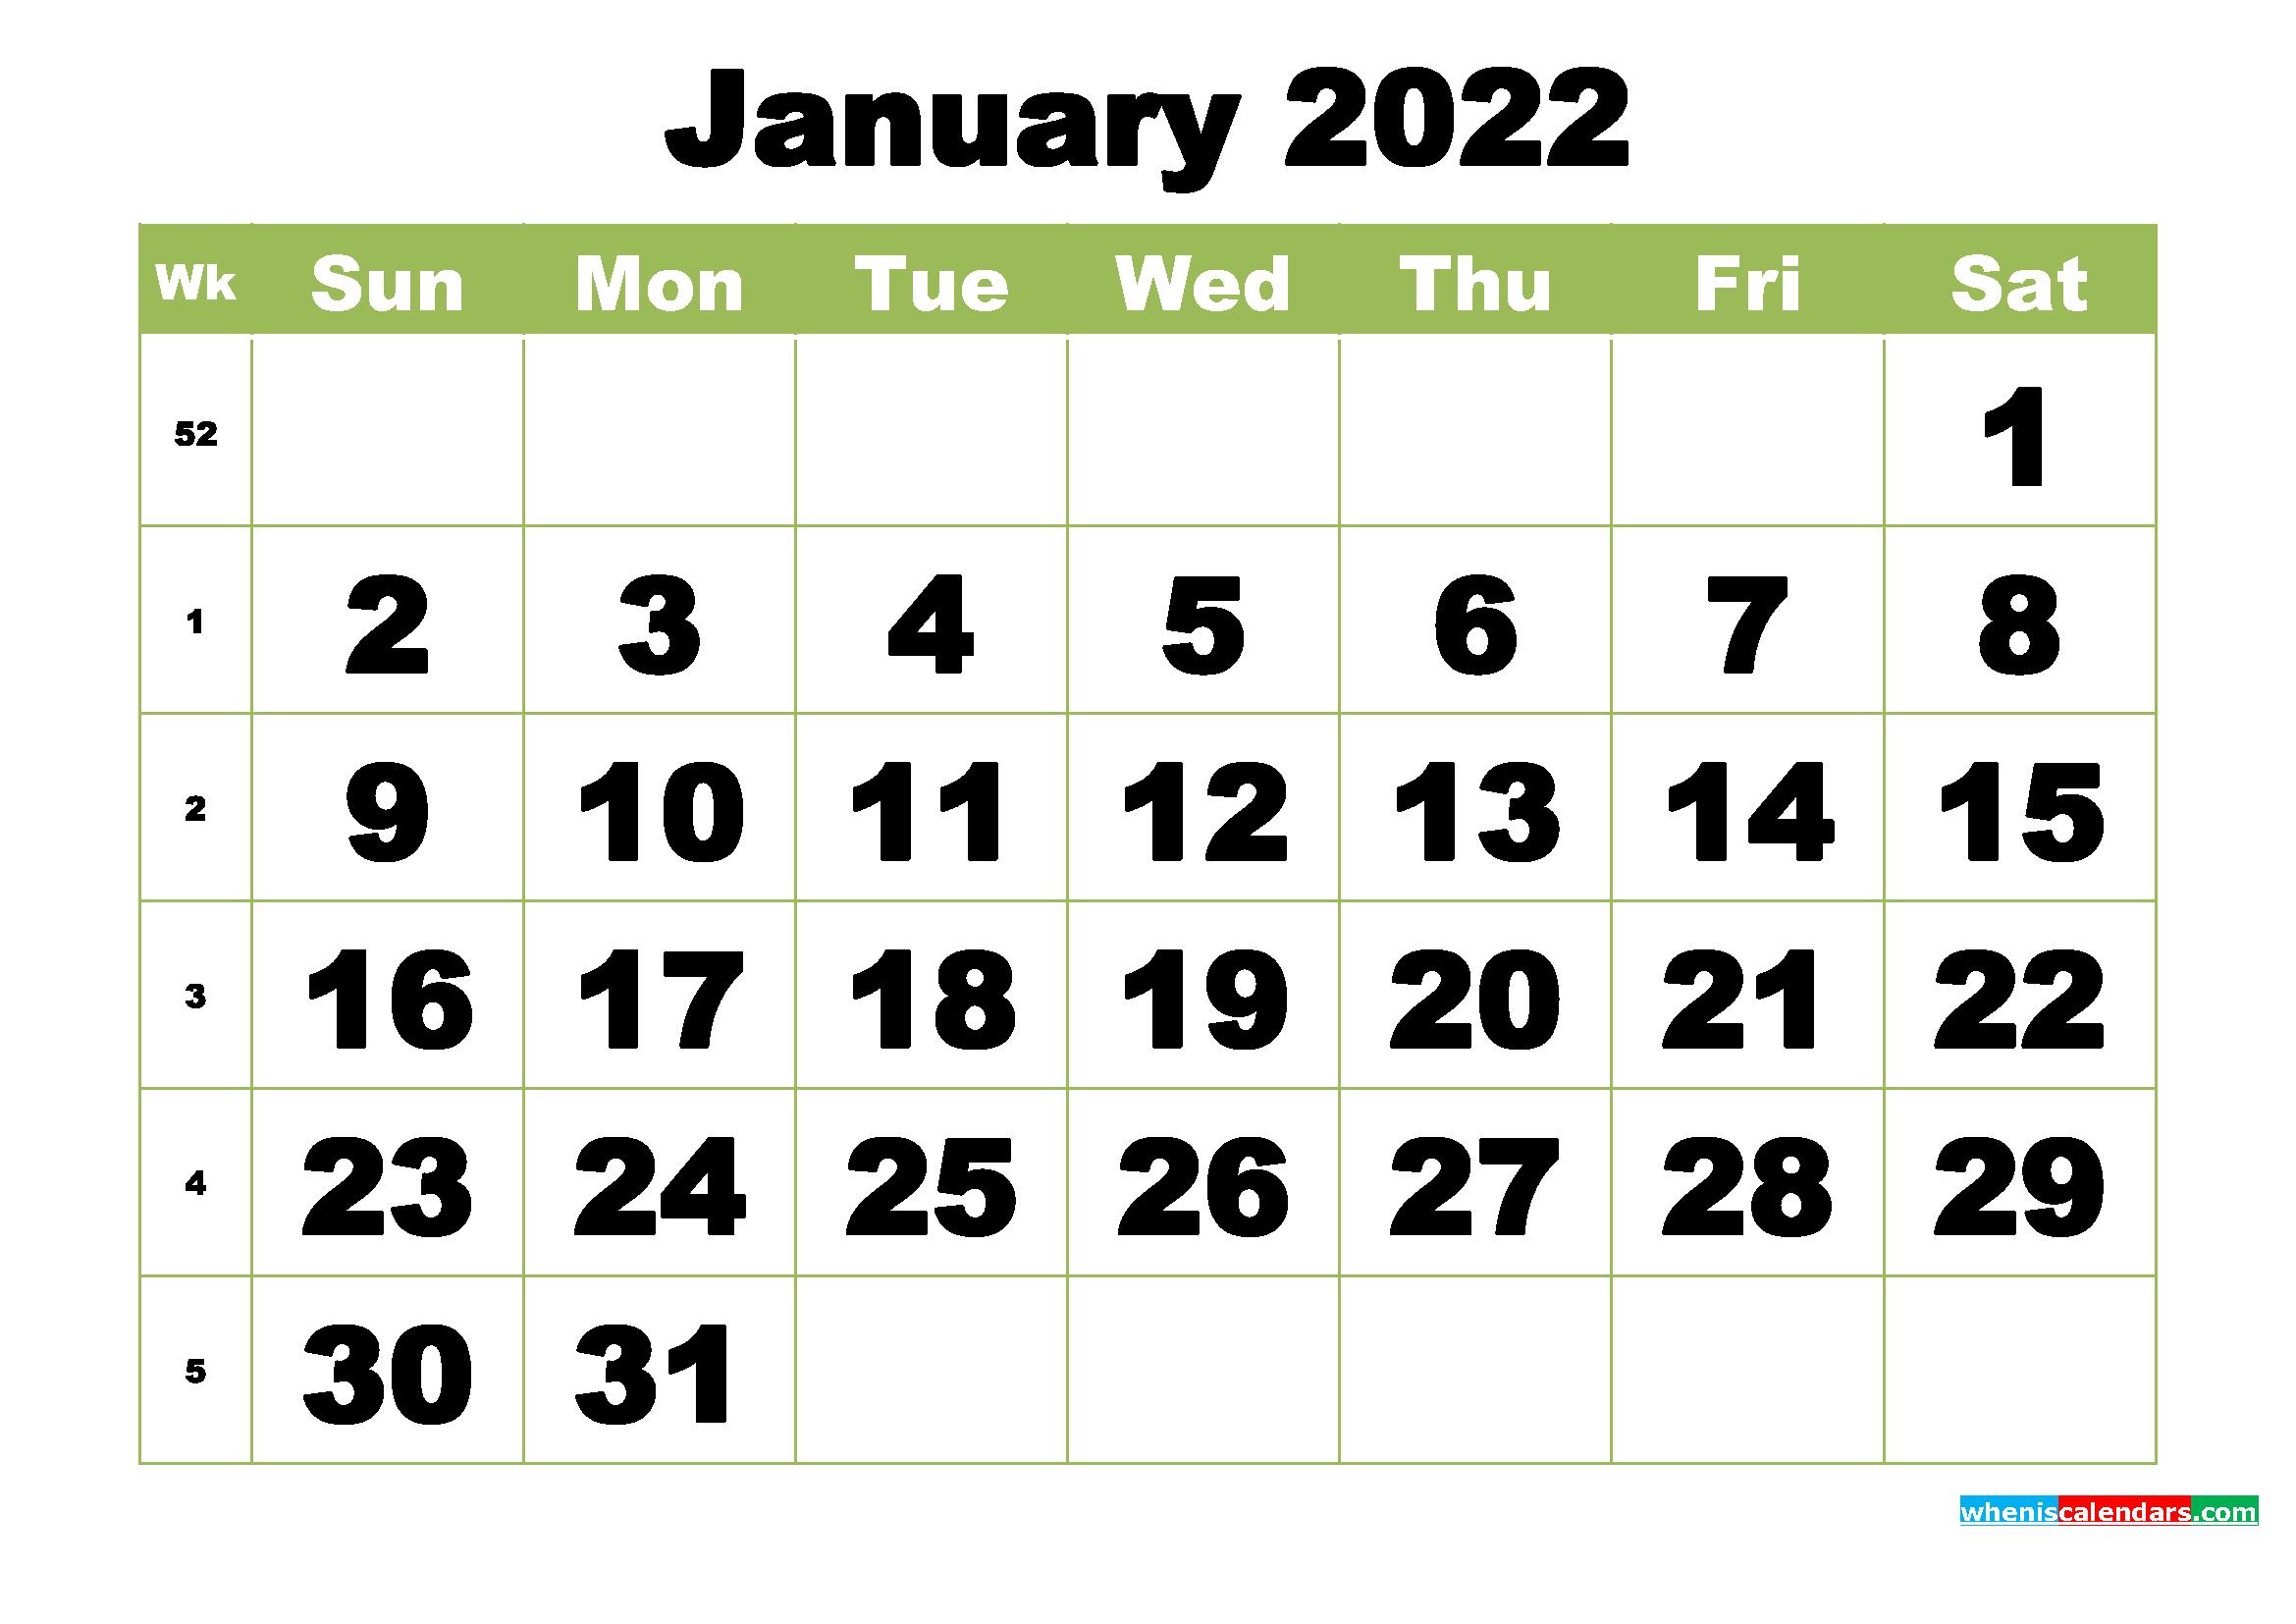 Free Printable Monthly Calendar January 2022 – Free With Calendar 2022 January Printable